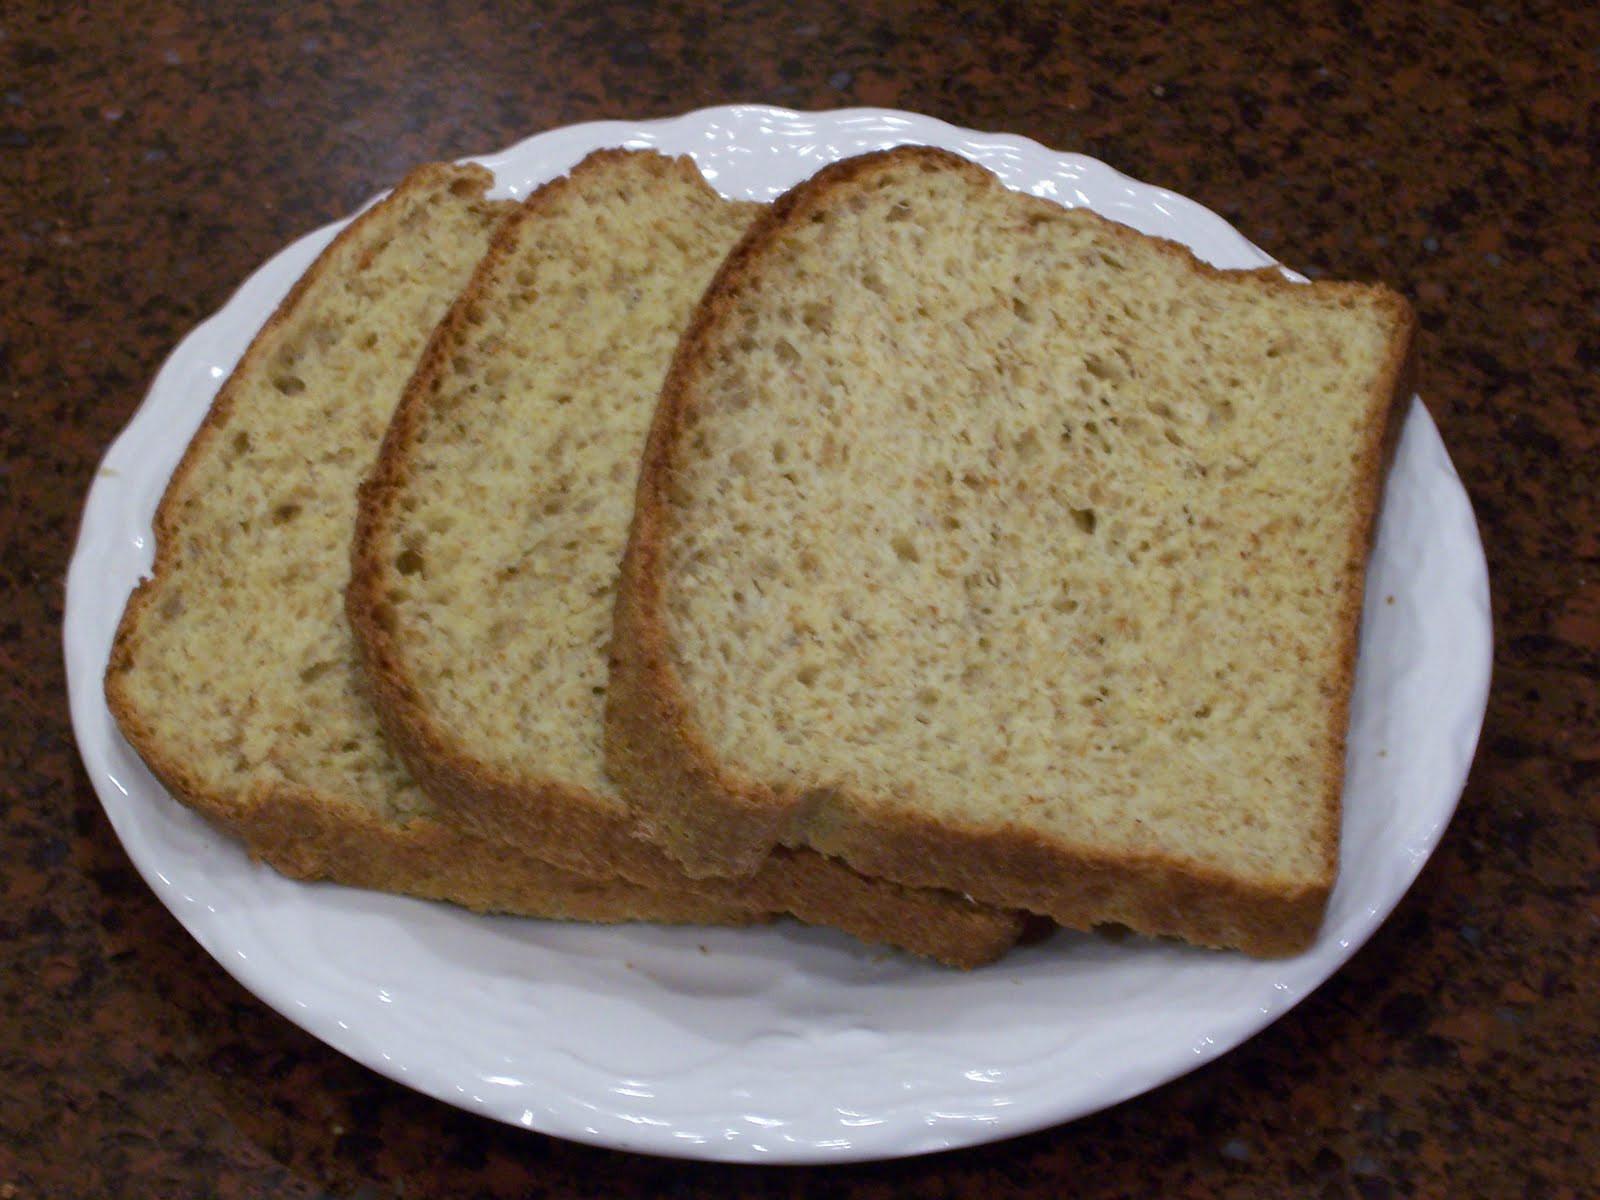 Low Carb Bread Recipes  Delicious Low Carb Recipes Low Carb Bread